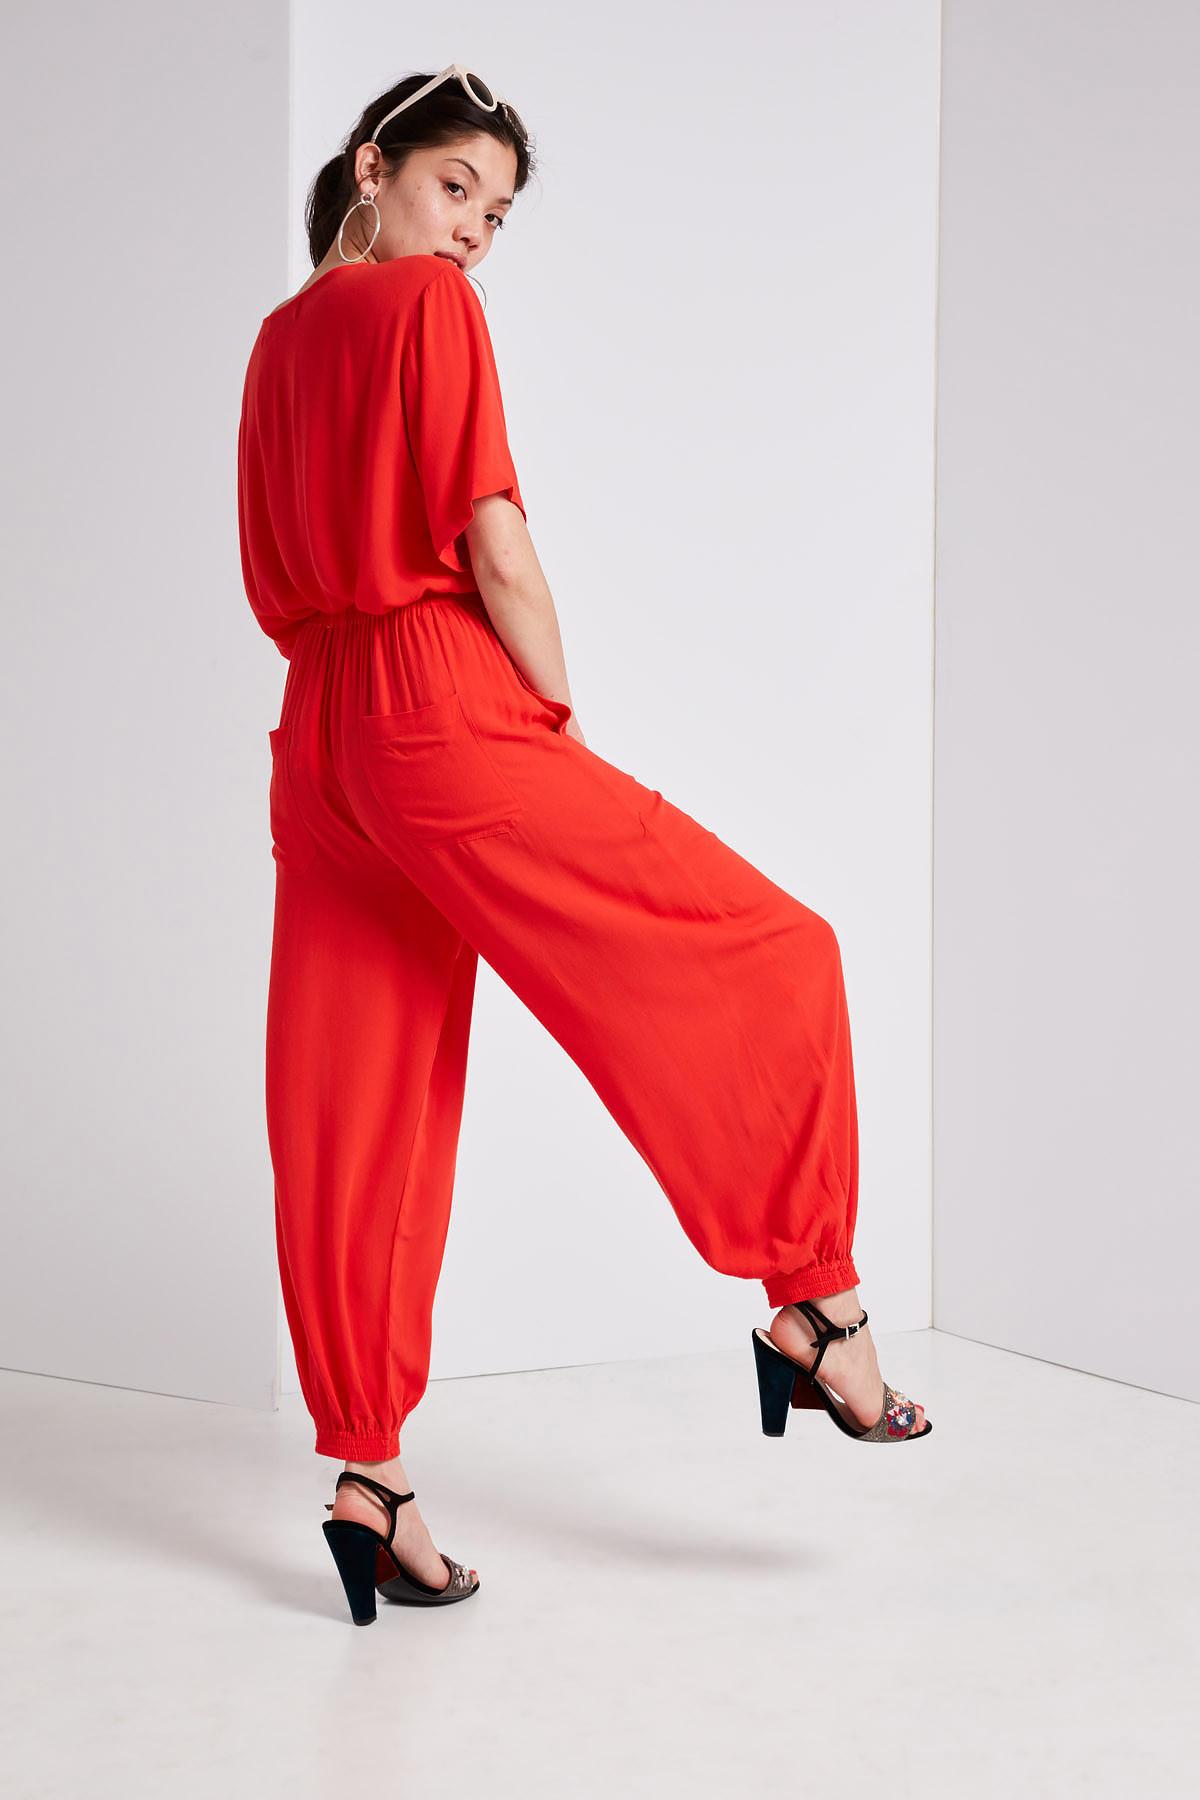 Australian Fashion Designer Louise Markey